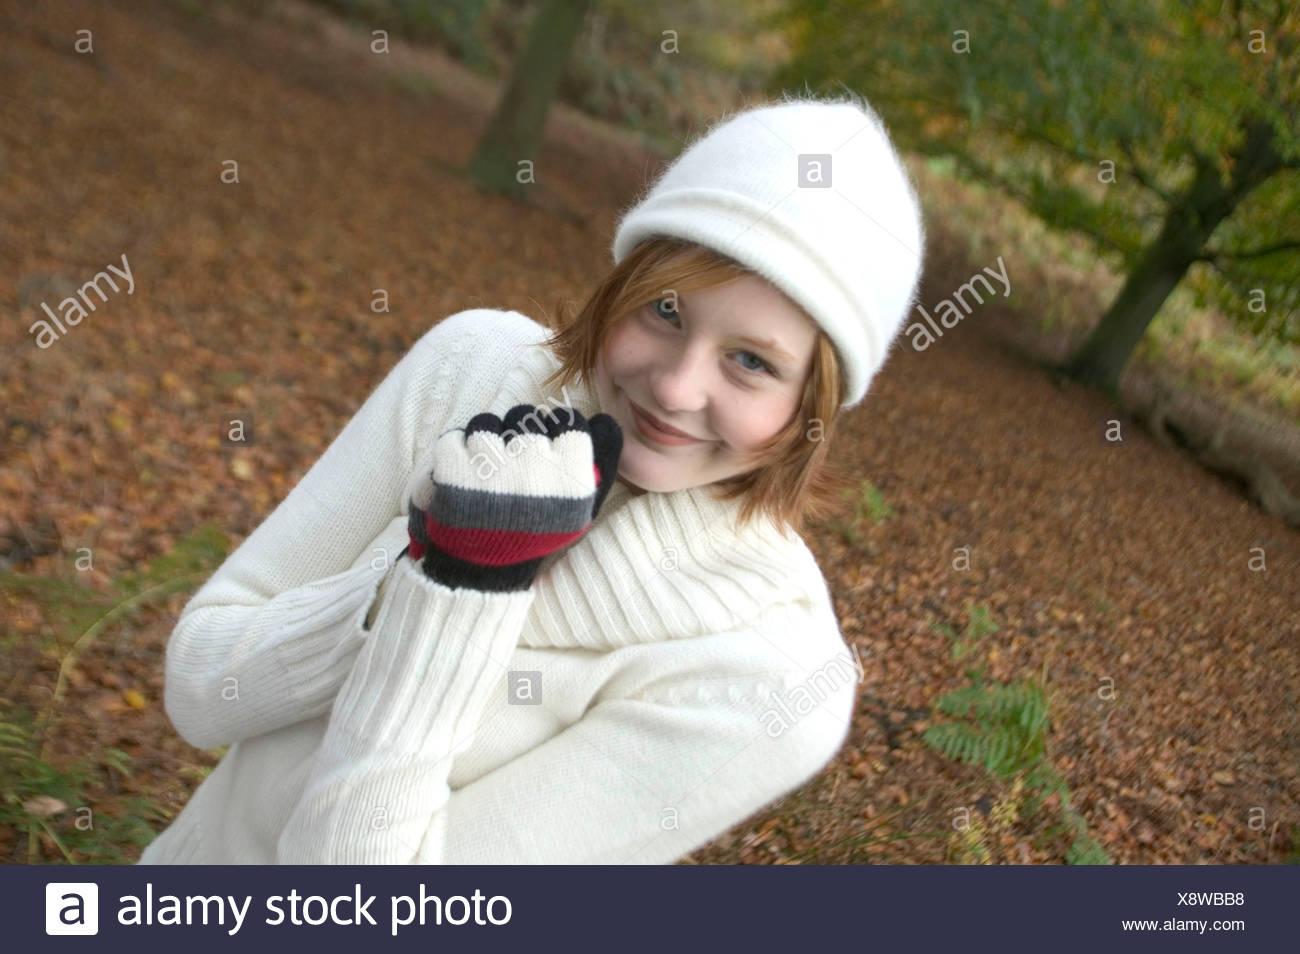 ec8f956b049 Female shoulder length red hair wearing white wool hat